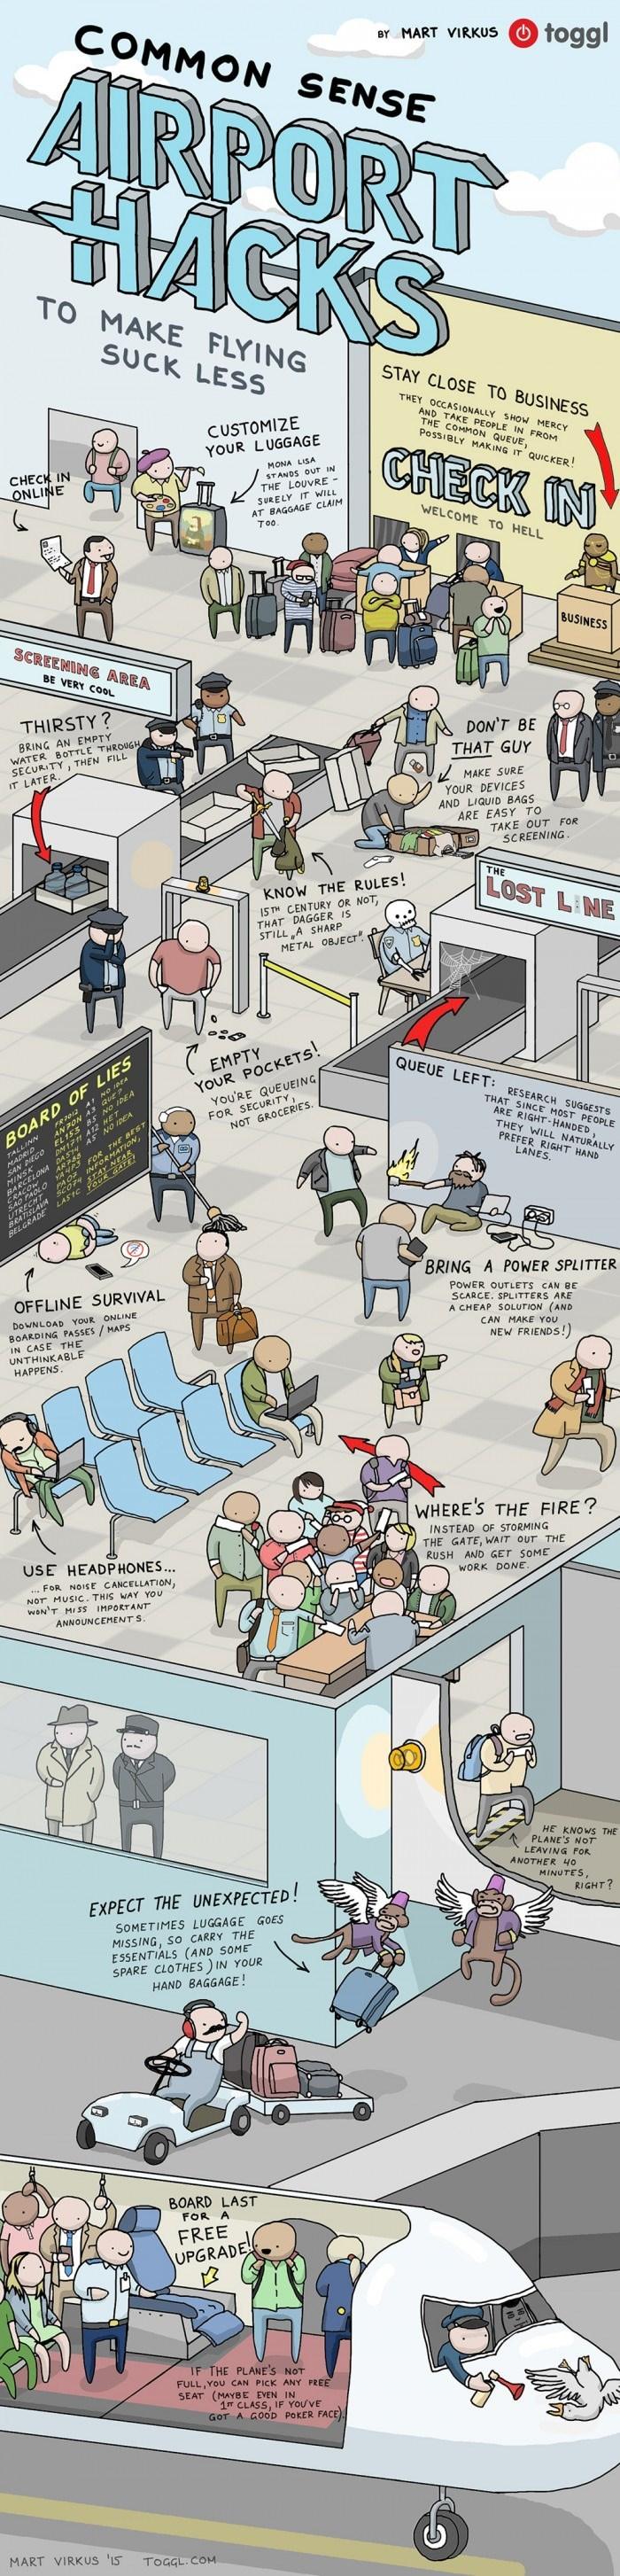 funny-web-comics-necessary-to-read-airport-hacks